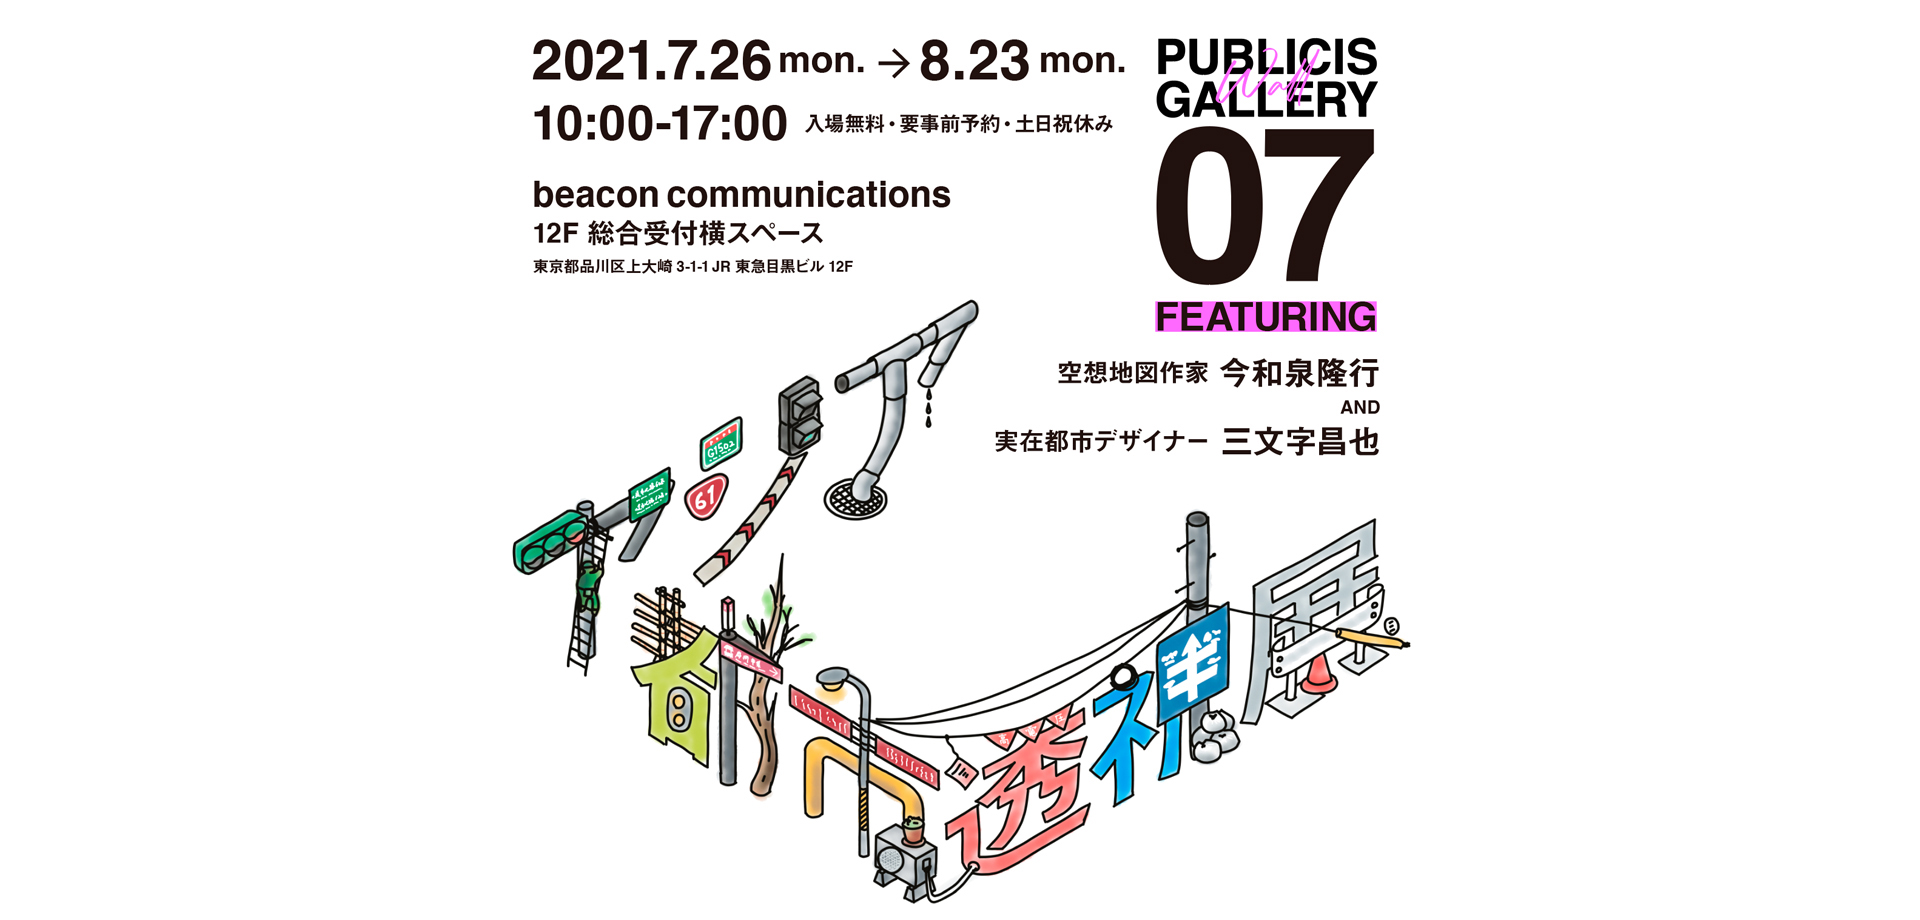 PUBLICIS WALL GALLERY 07 「アジア都市透視展」